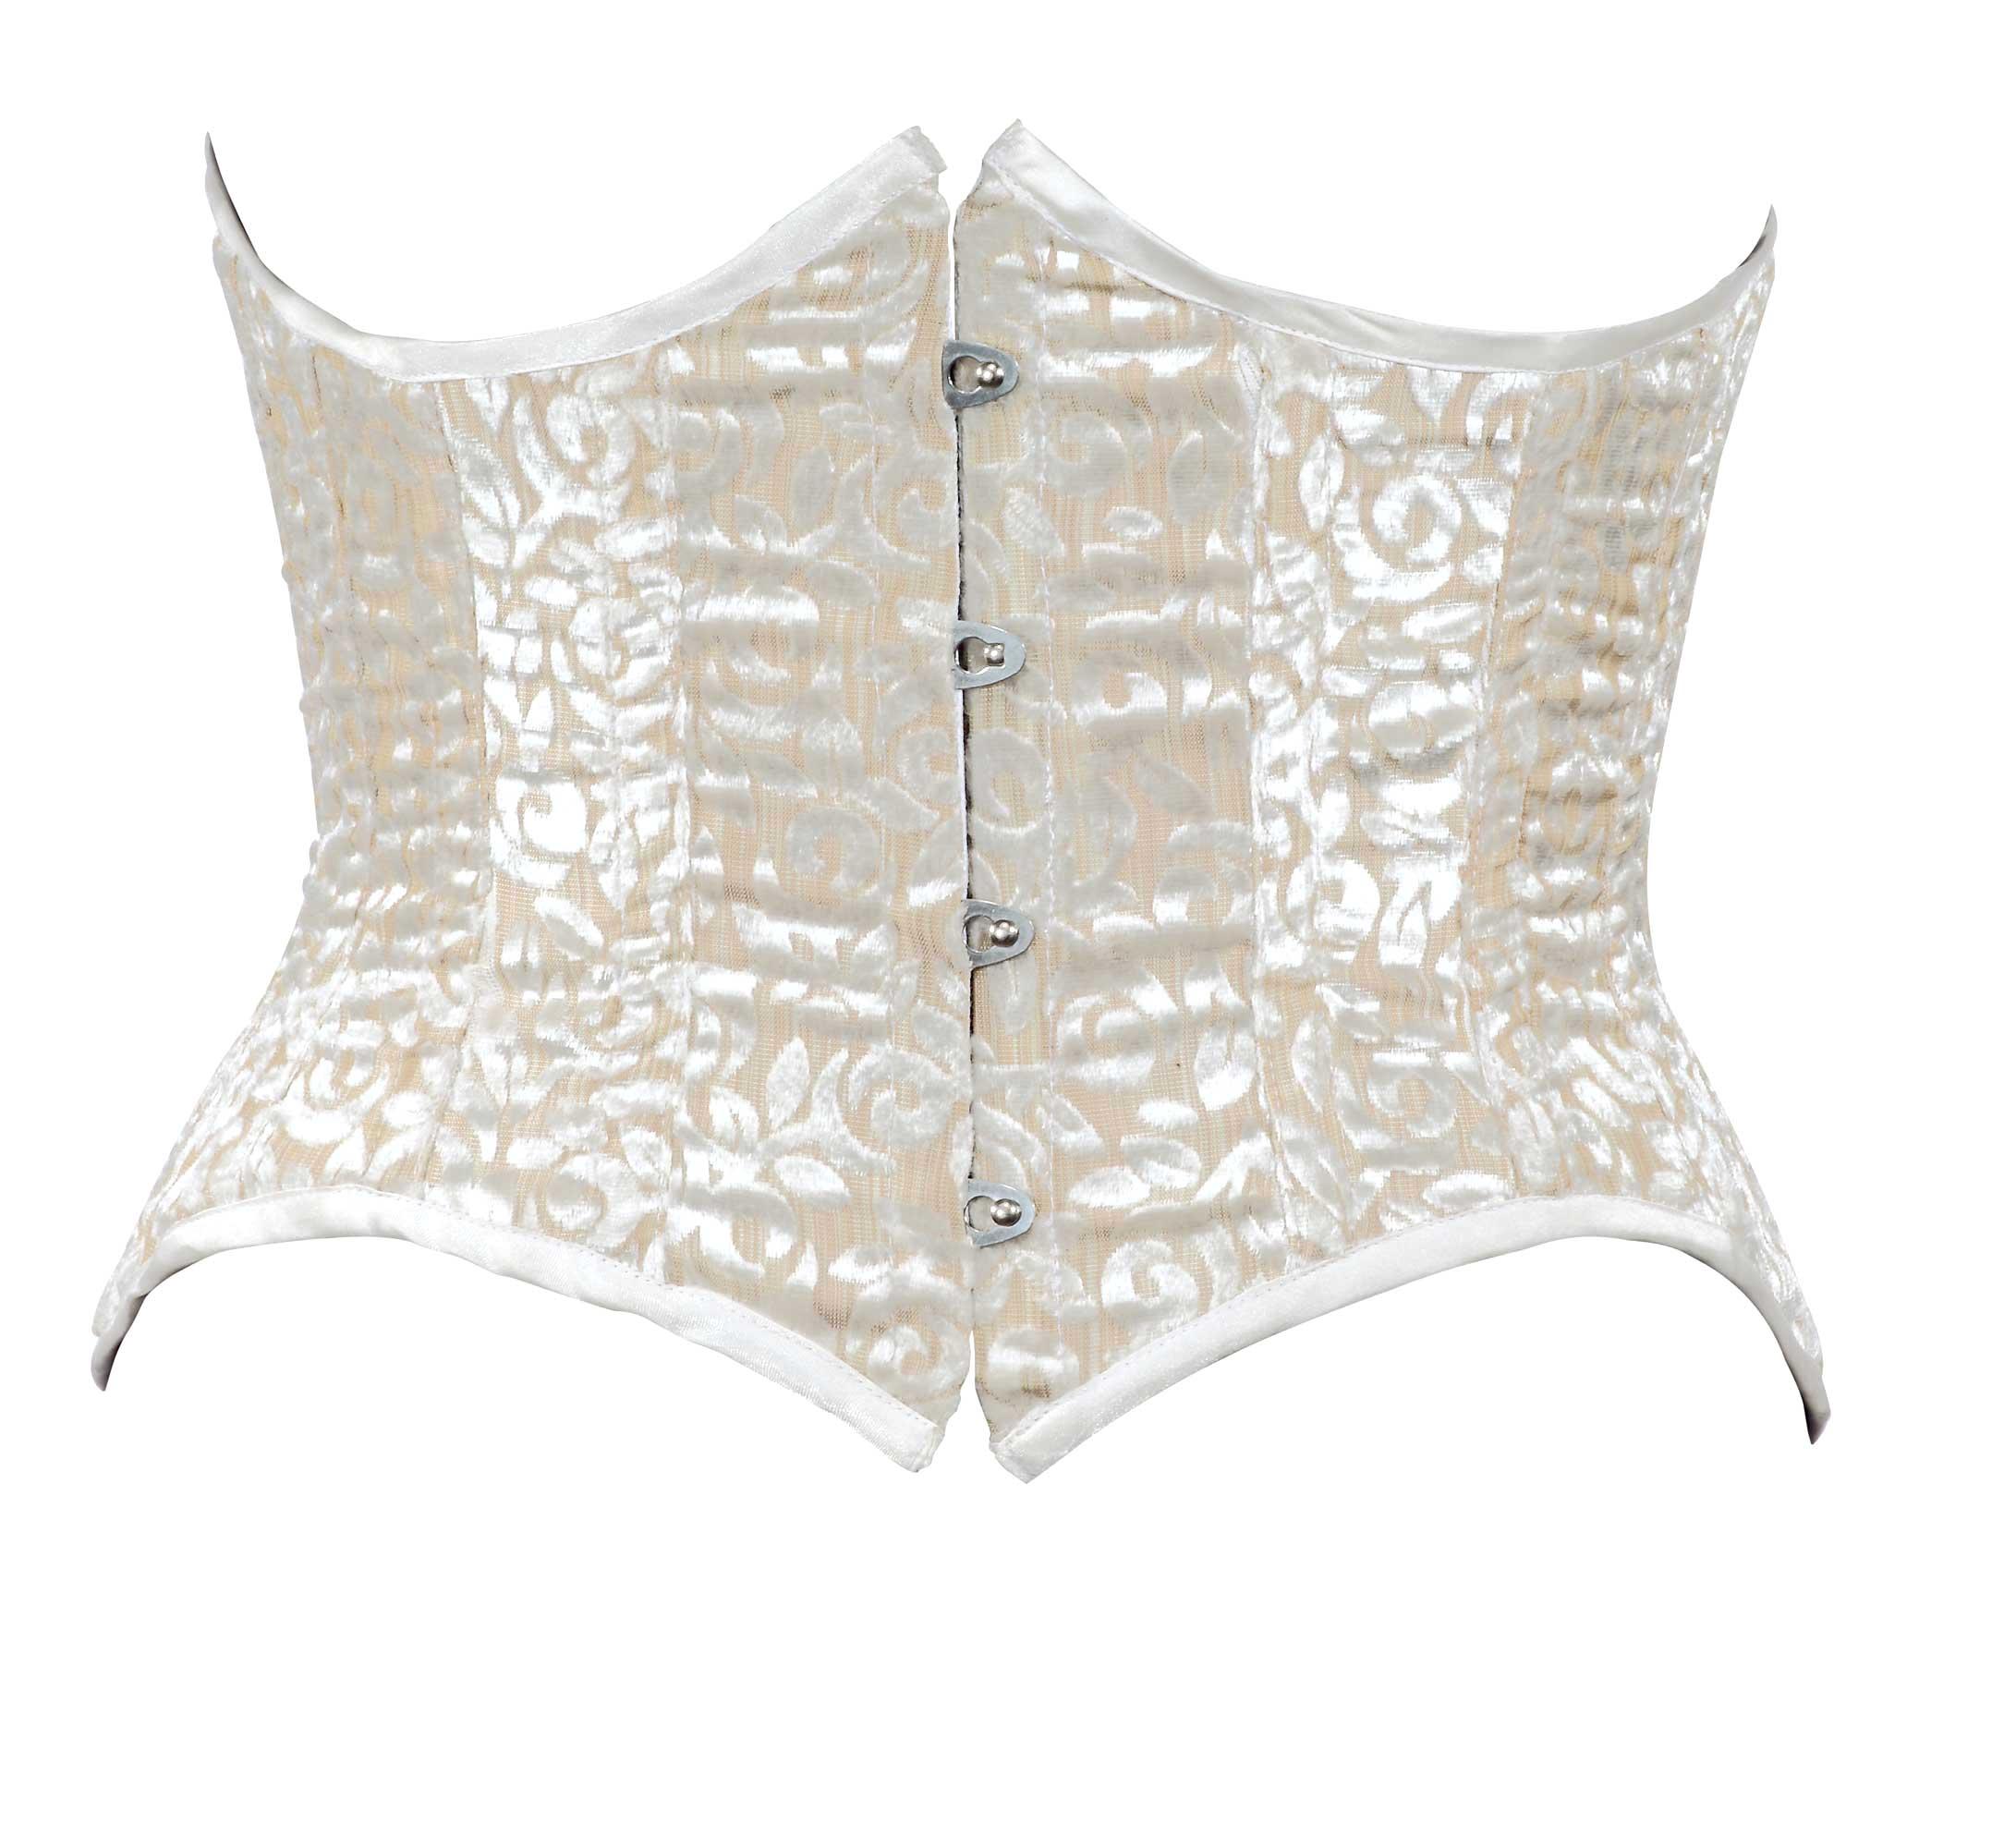 silver_floral_brasso_velvet_fabric_steel_boning_underbust_corset_waist_cincher_bustier_bustiers_and_corsets_5.jpg